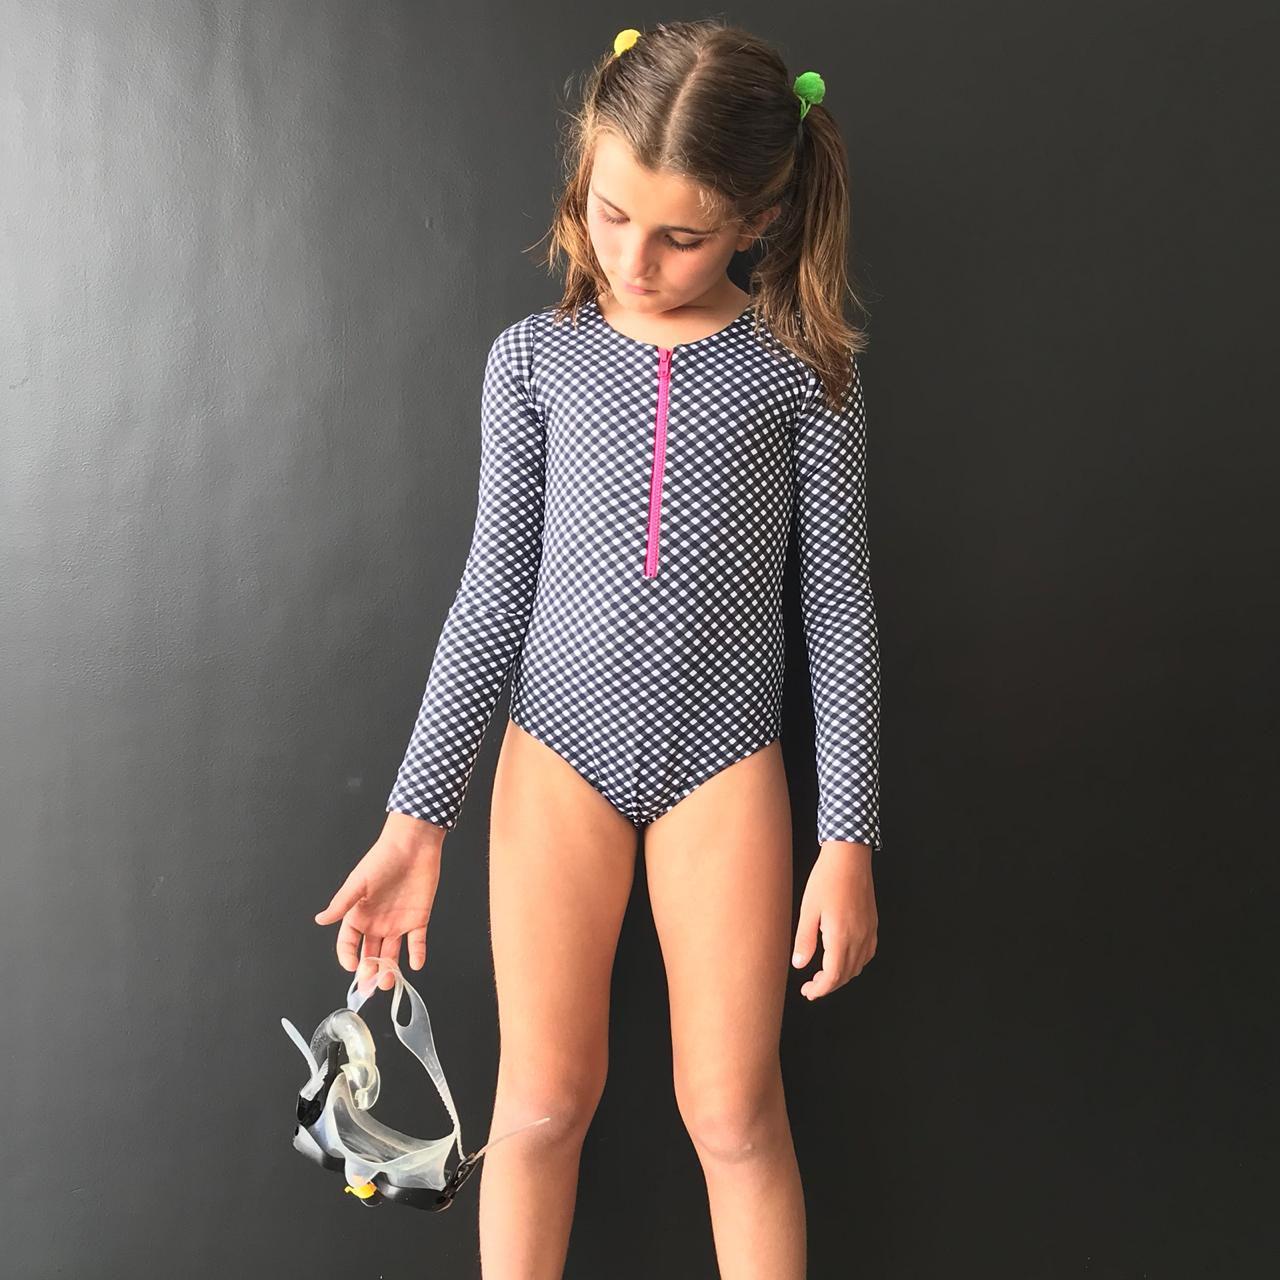 Maiô Surf Infantil Xadrez com Zíper